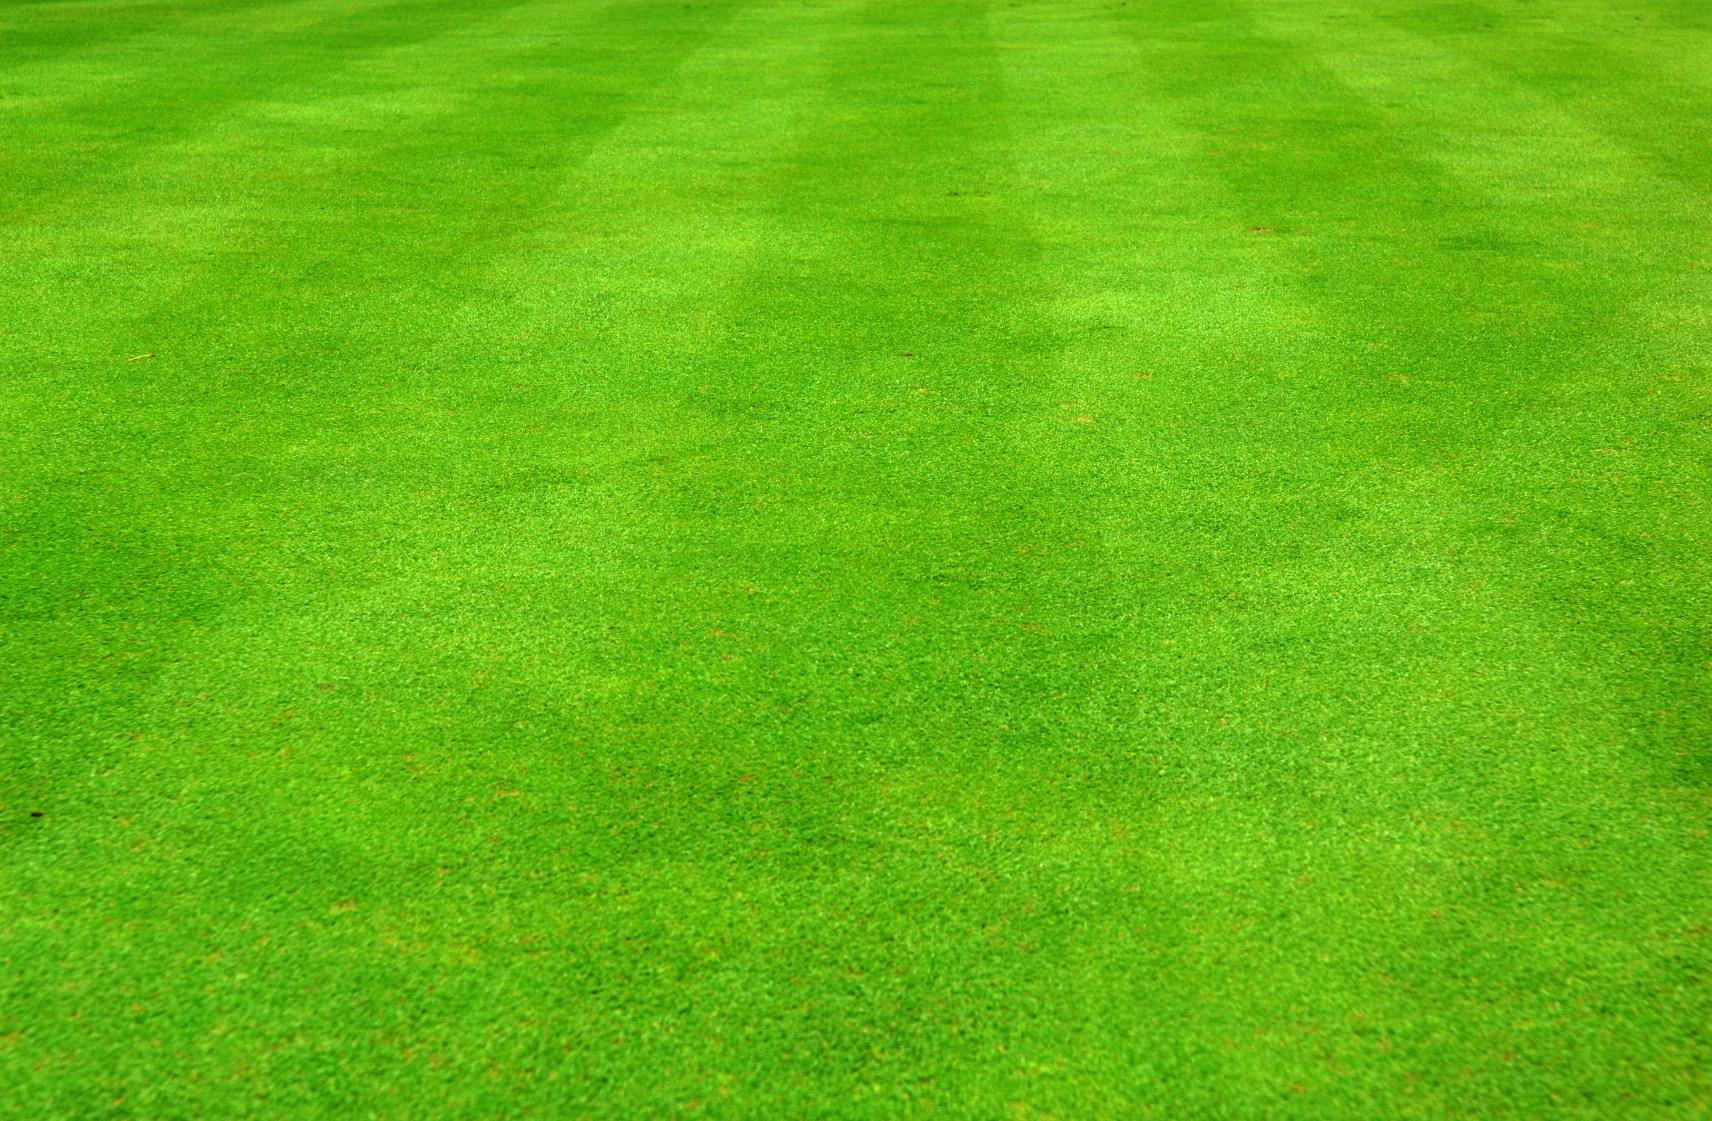 39697a0673e7ef0212a5d18a2f7c52b6_grass-field-clipart-dromhfj-soccer-grass- field-clipart_1712-1121